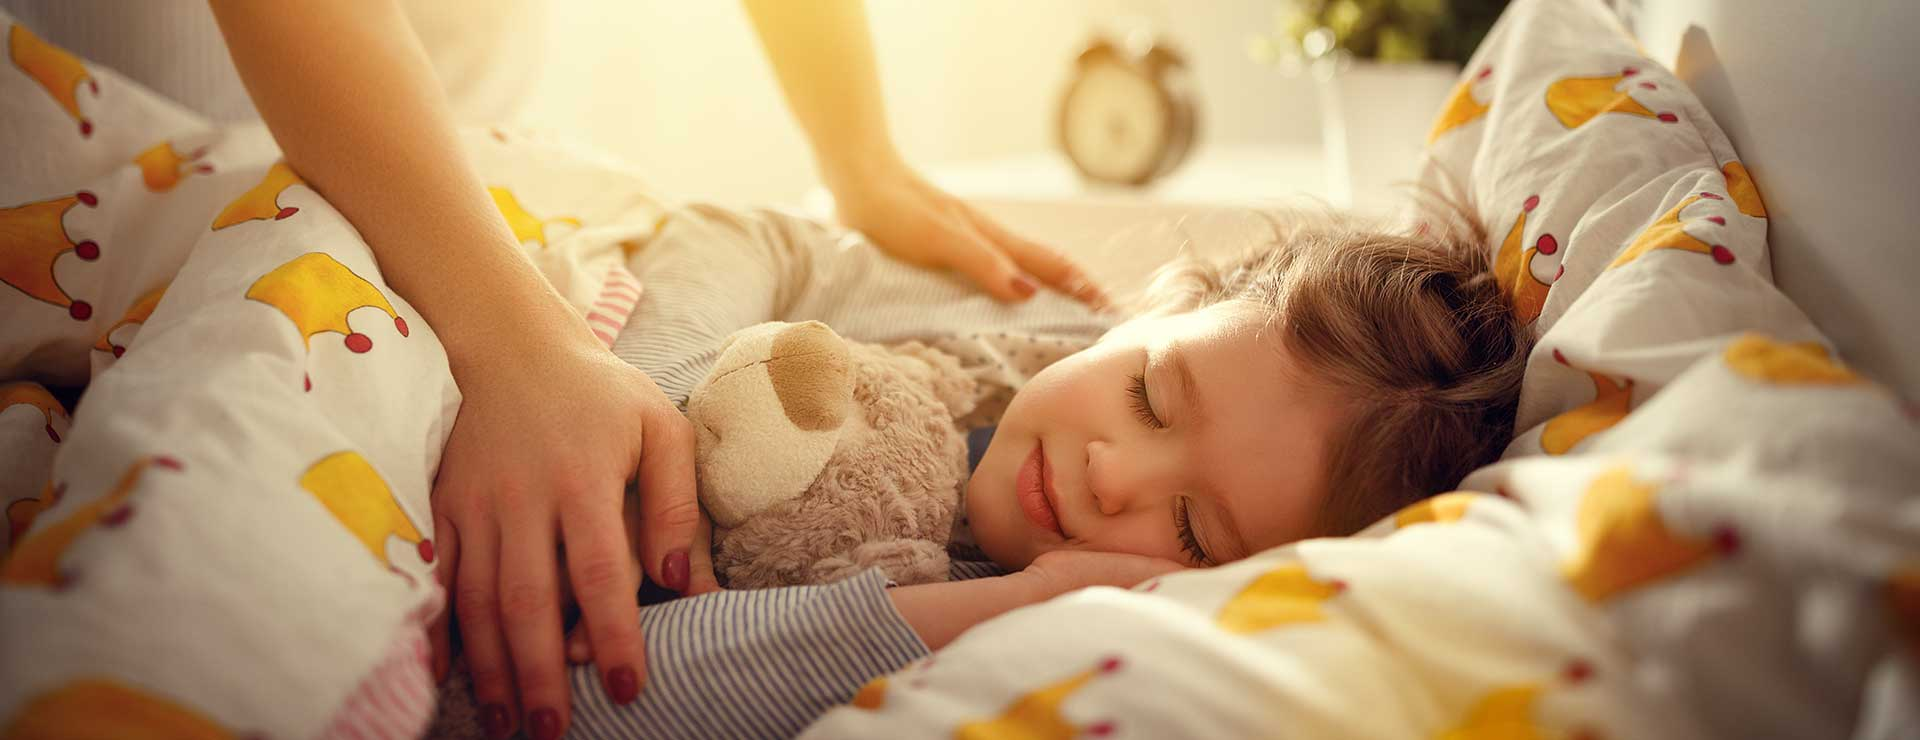 Start of School Can Worsen Bedwetting in Children | Johns ...